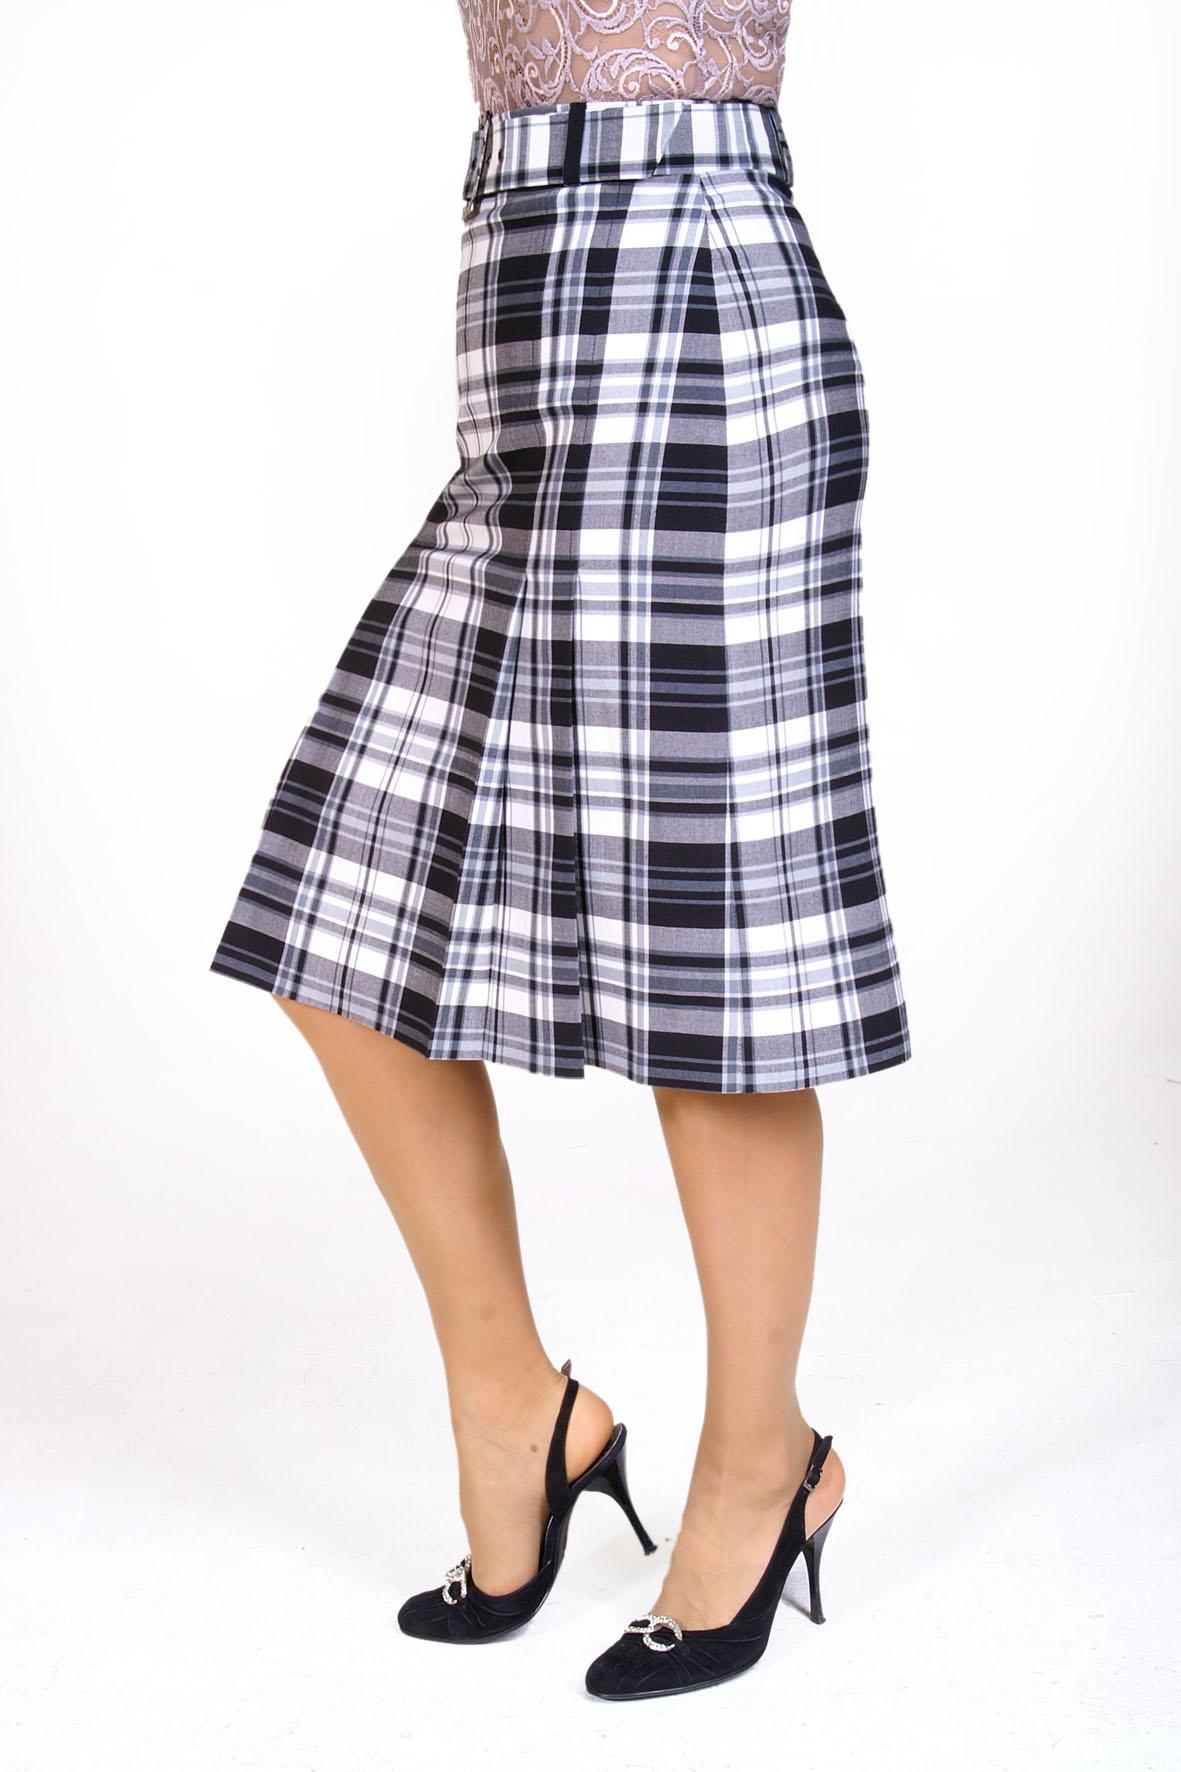 Швейная фабрика брюки юбки